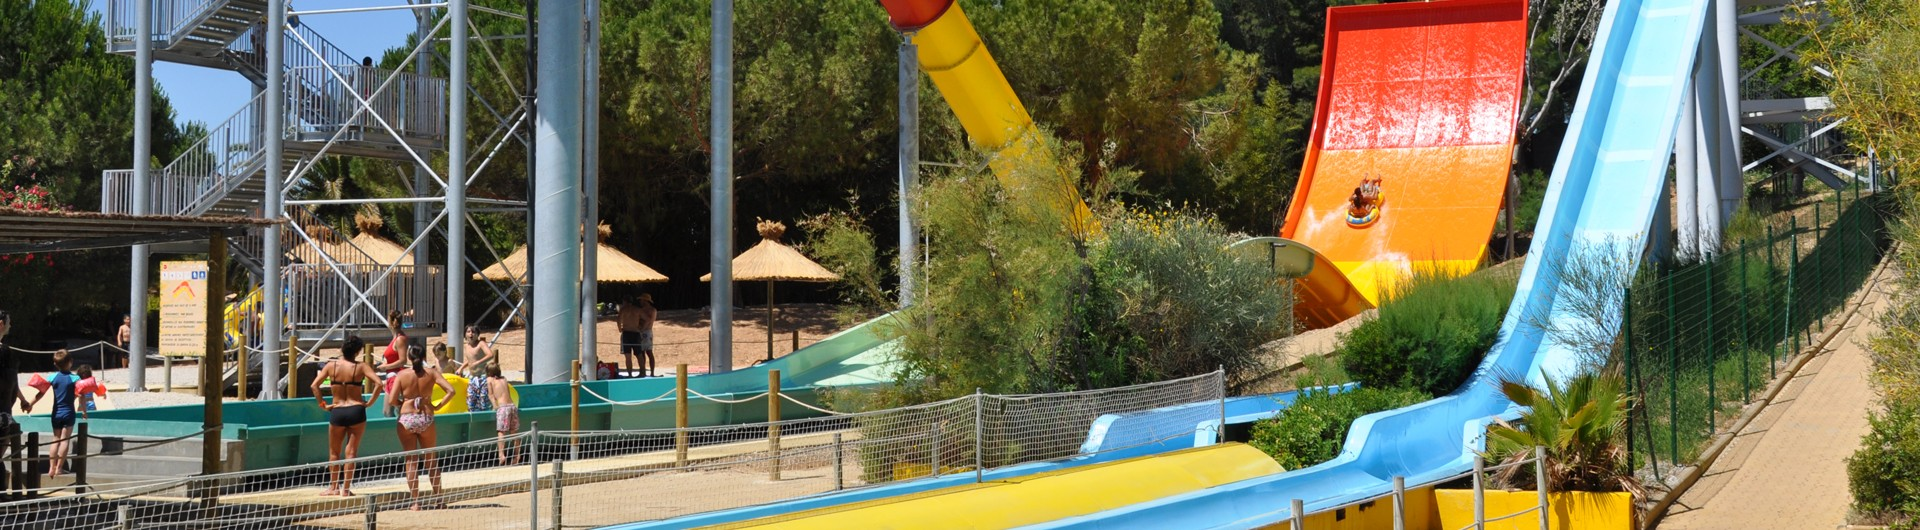 parc attraction six fours